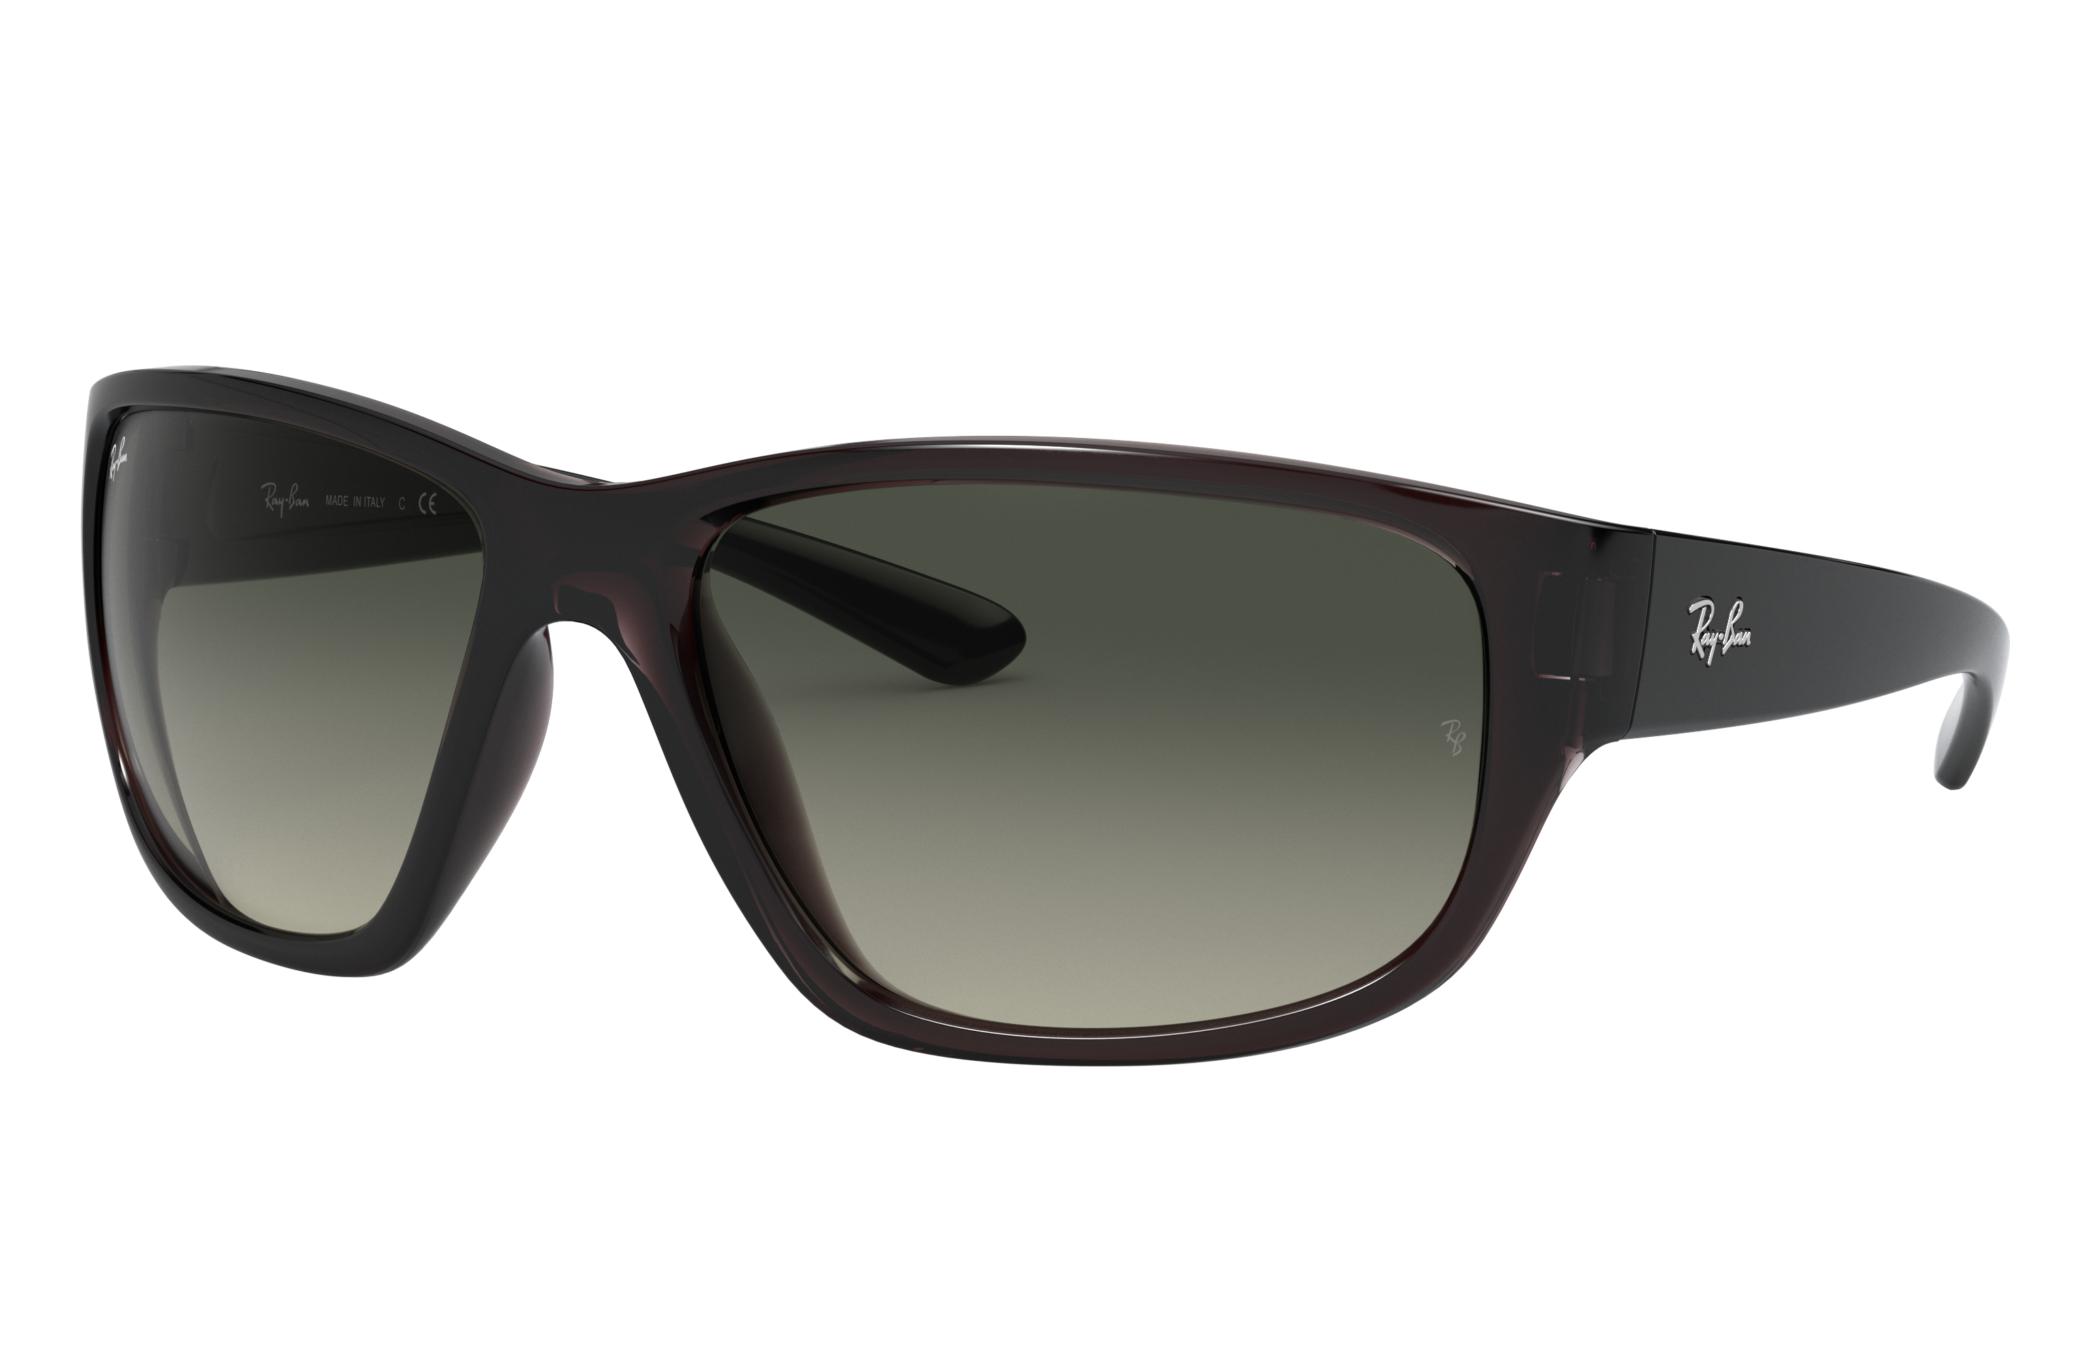 Ray-Ban Rb4300 Transparent Grey, Gray Lenses - RB4300